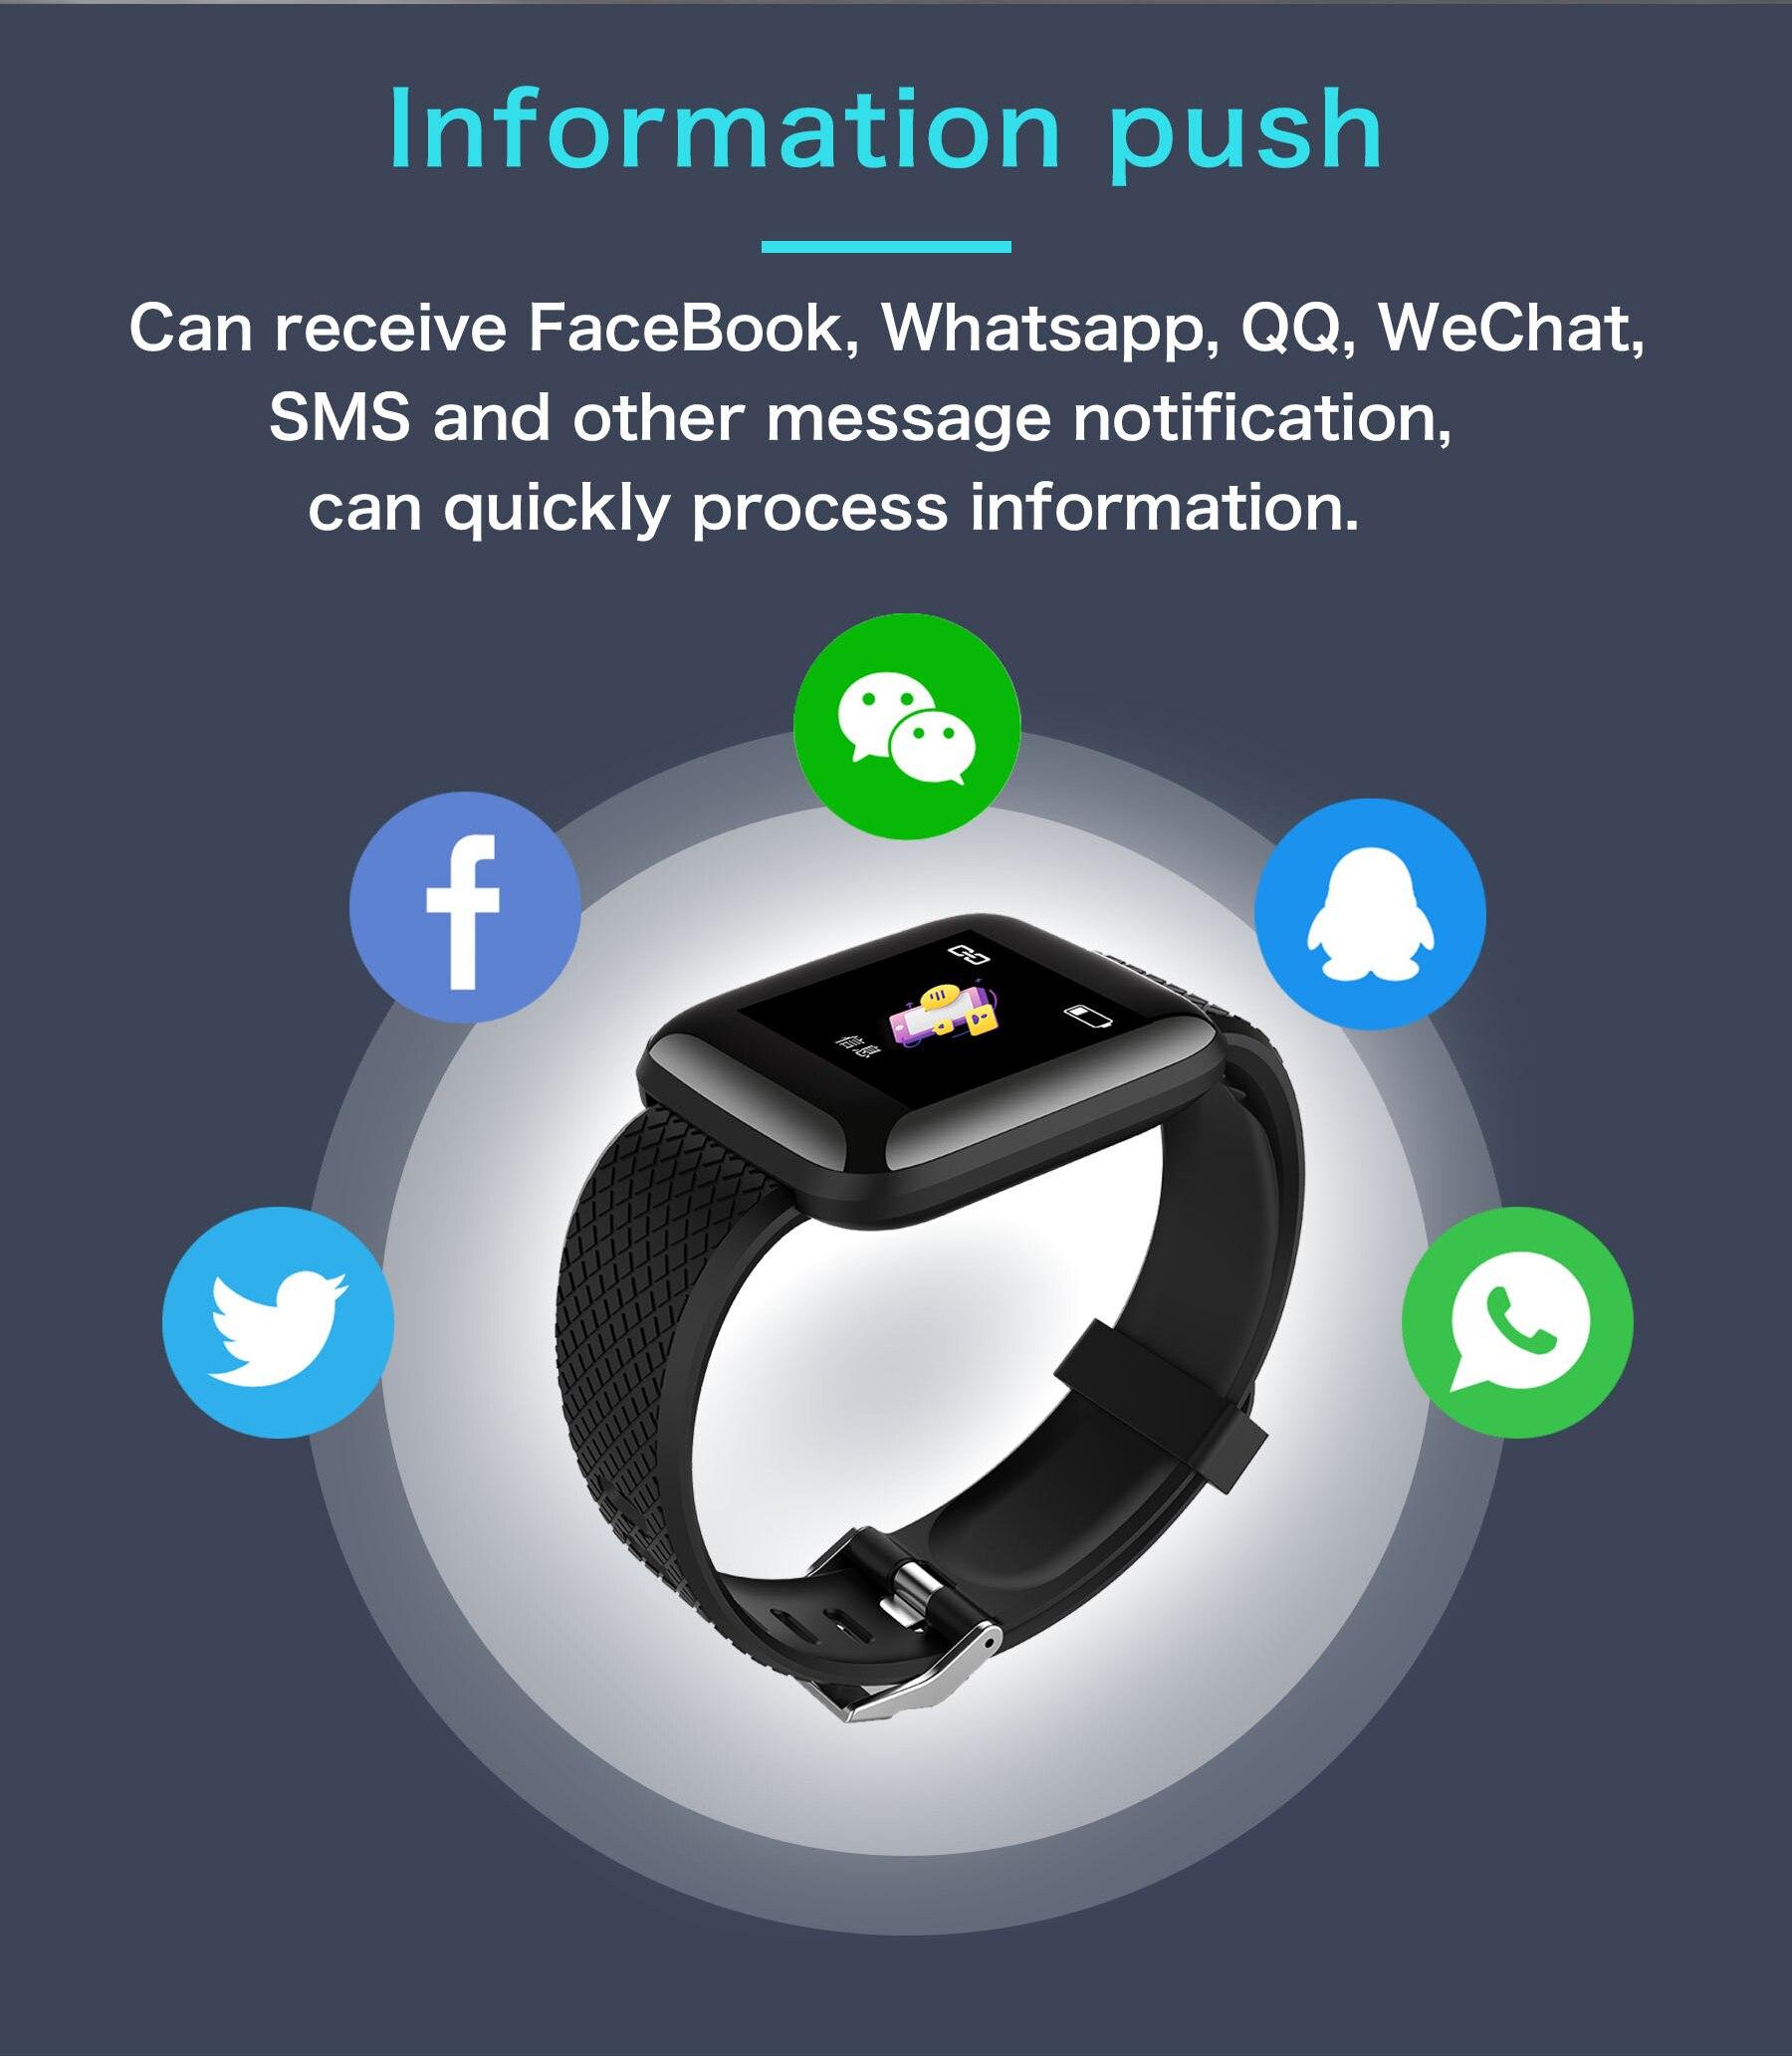 HTB1HTNsRrvpK1RjSZPiq6zmwXXaJ Doolnng Smart band wristband Sport fitness Tracker bracelet Heart Rate Monitor blood Pressure measurement Smartband Watch